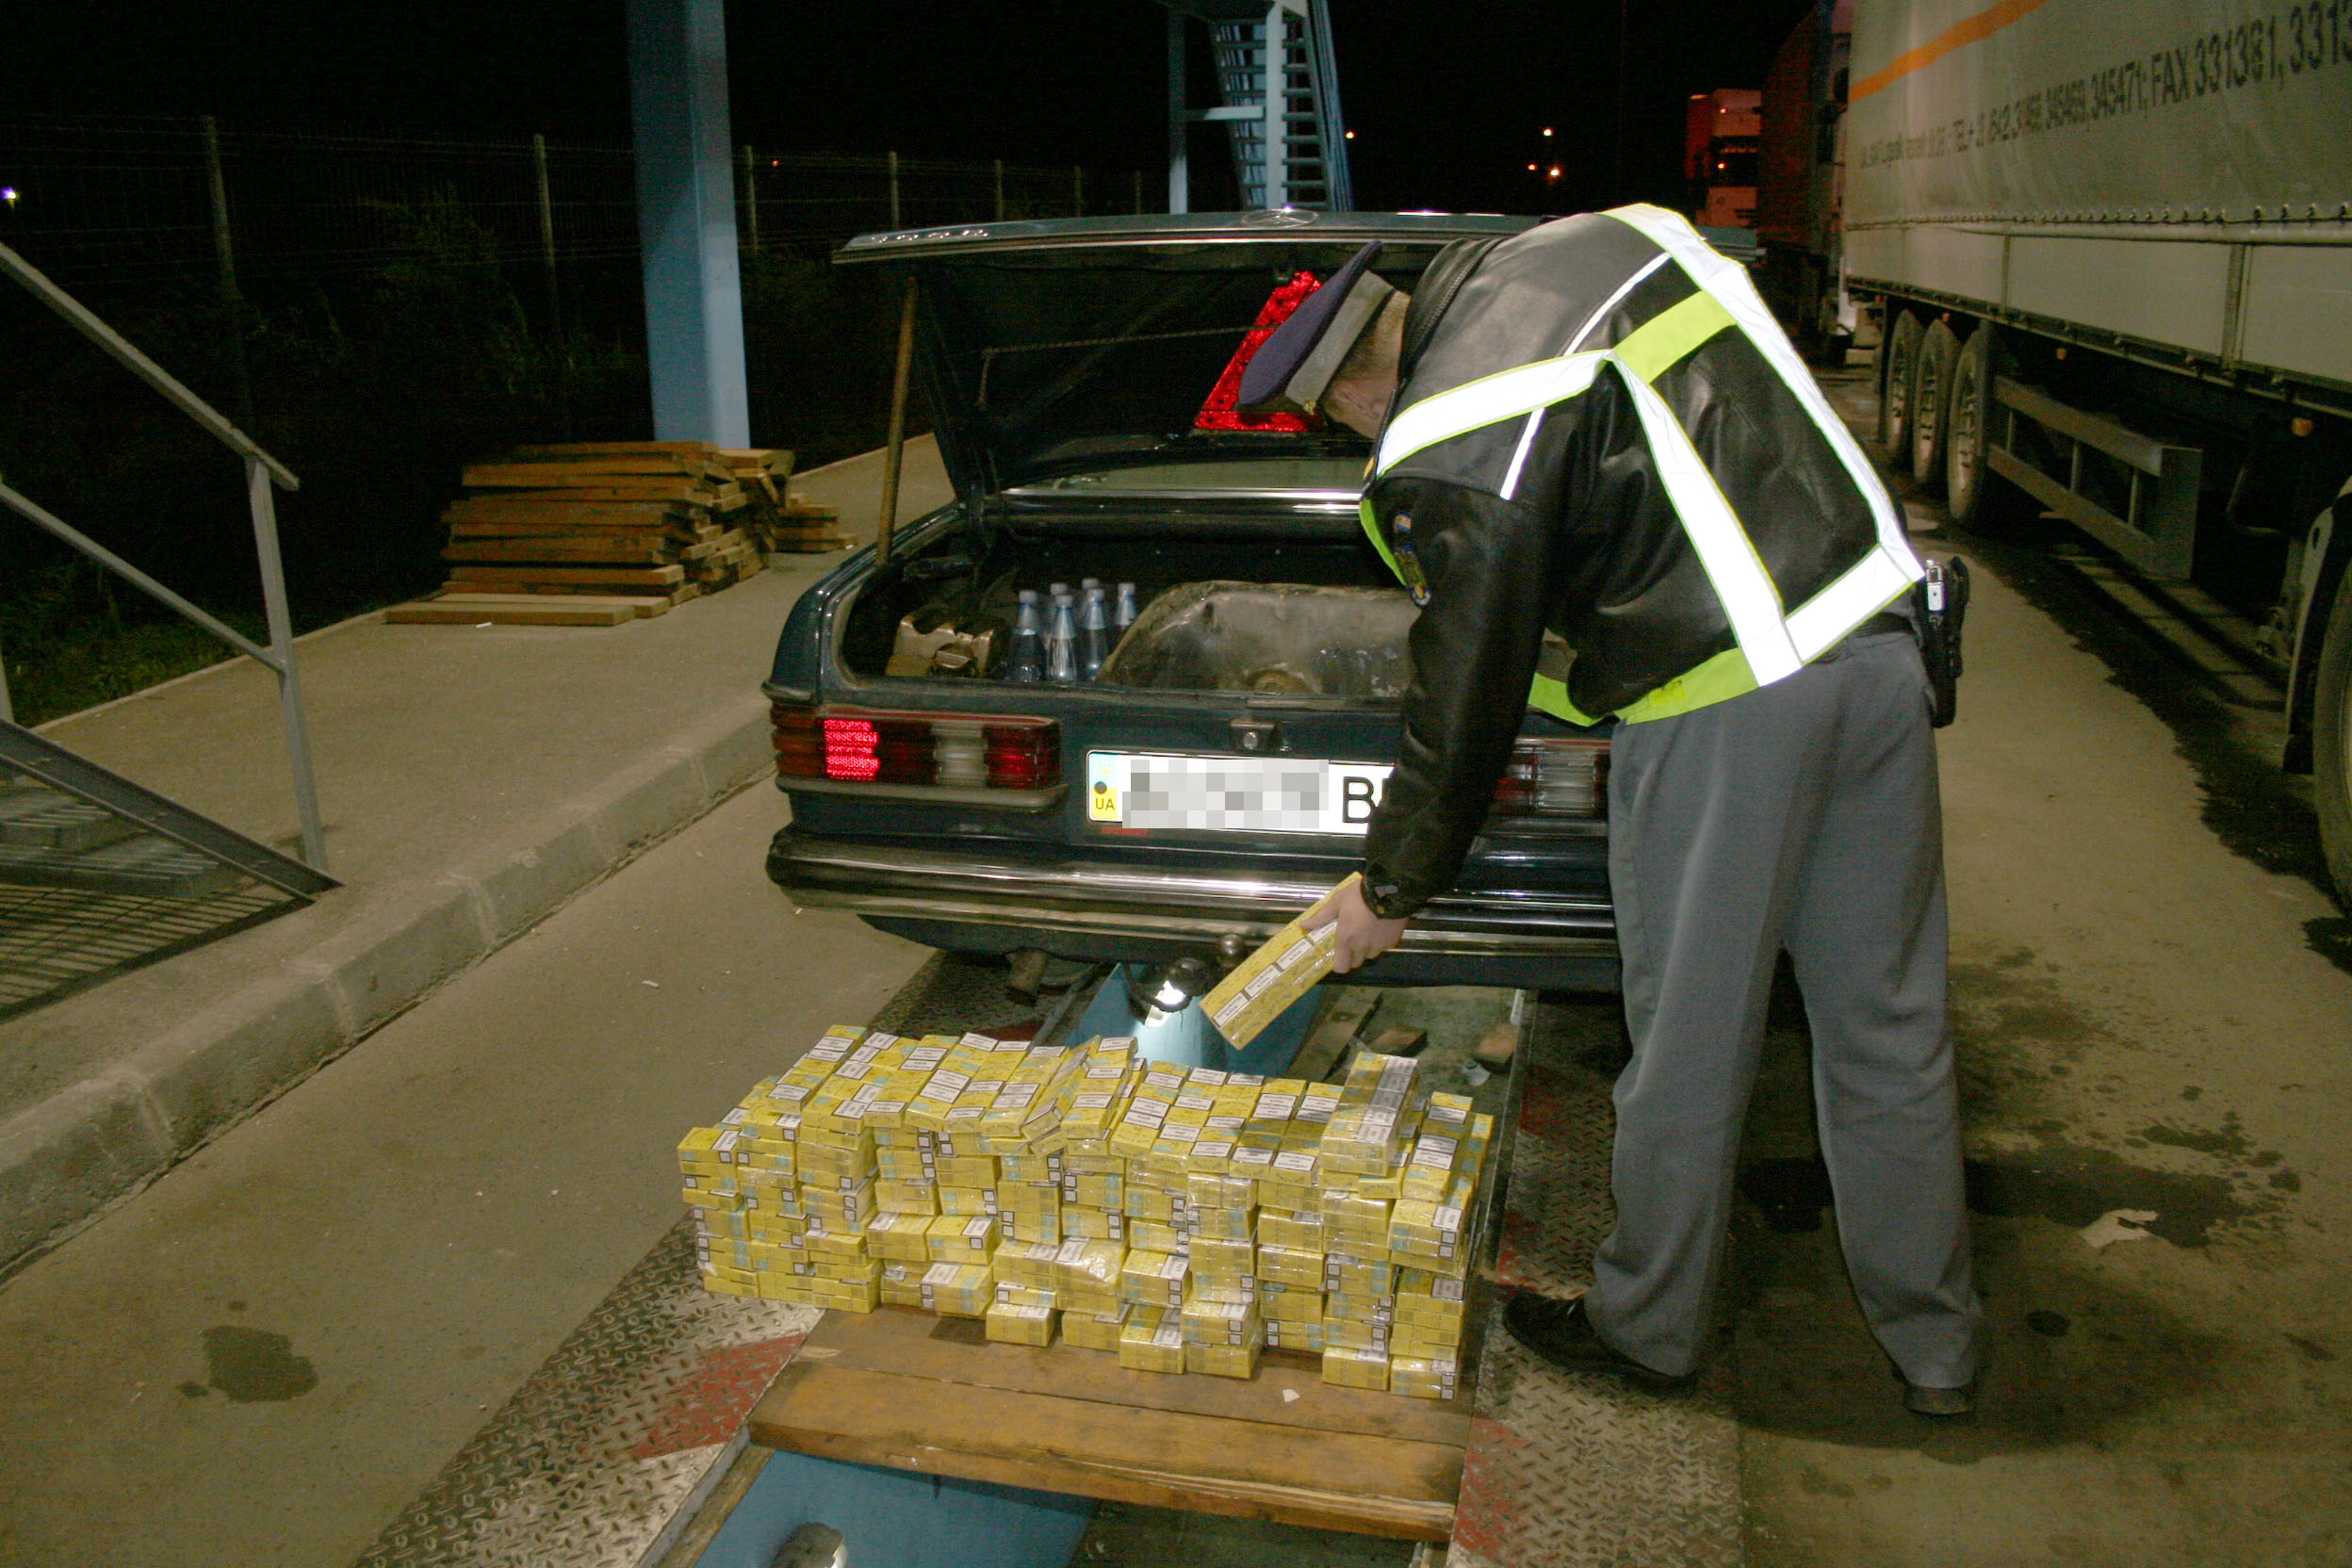 Contrabanda cu tigari, la ordinea zilei. Un ucrainean a fost prins cu 800 de pachete de tigari